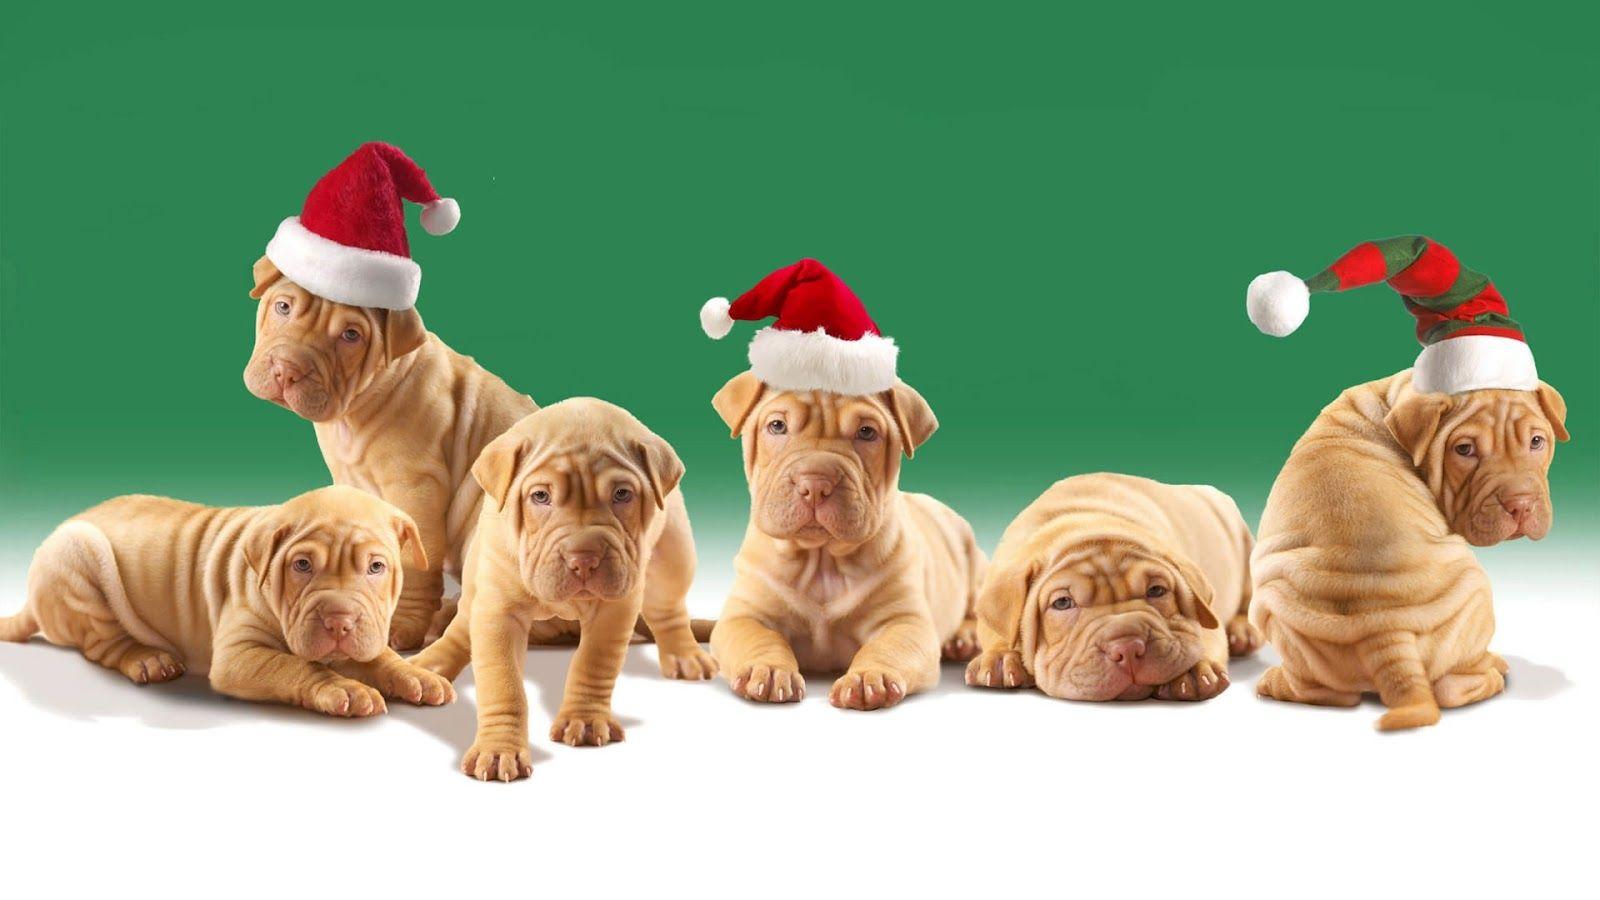 Cute Christmas Desktop Wallpaper | Cute Christmas Dog - Wallpapers ...